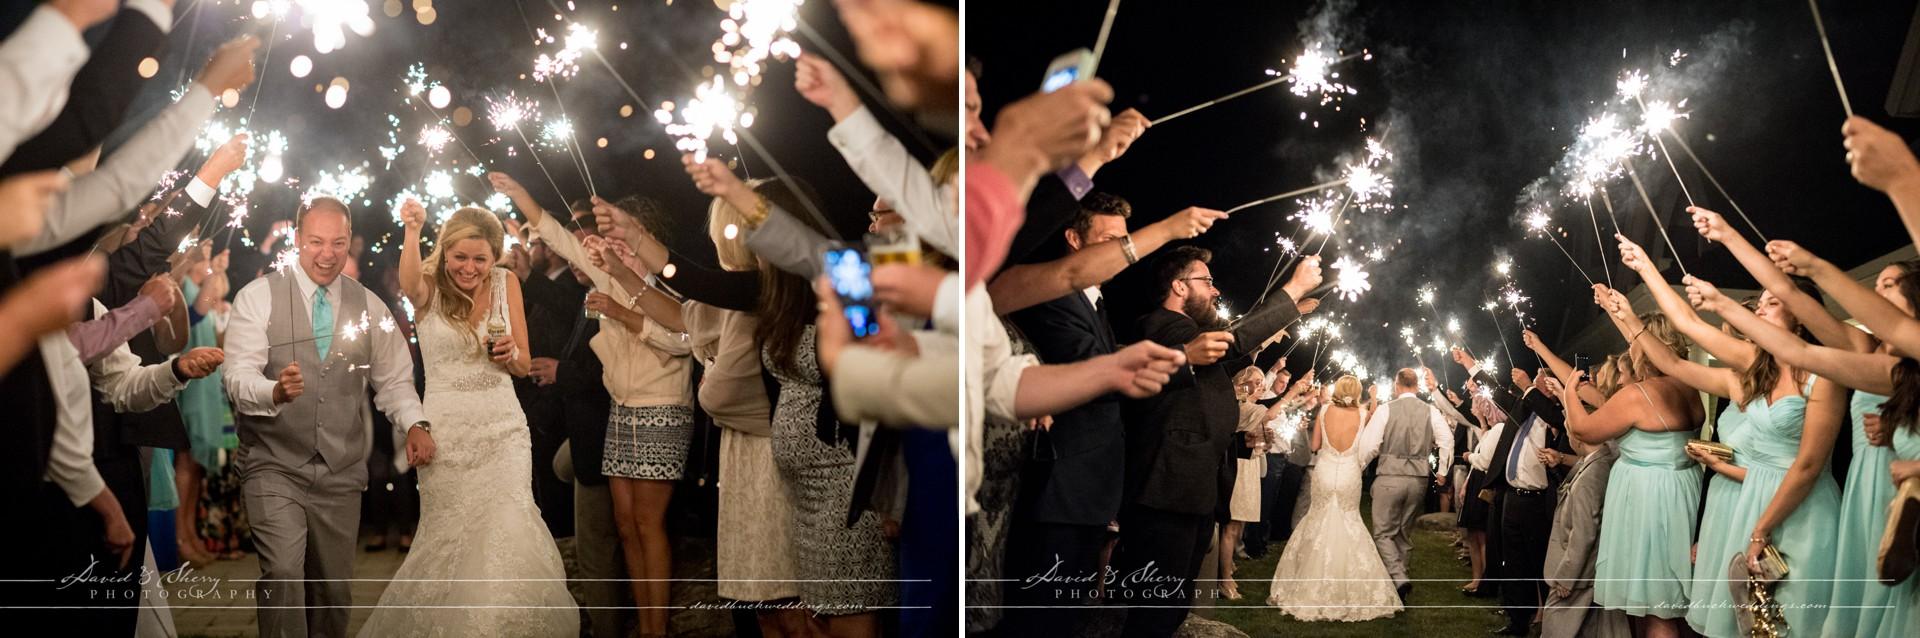 Cobble_Beach_Wedding_Photography_Owen_Sound_44